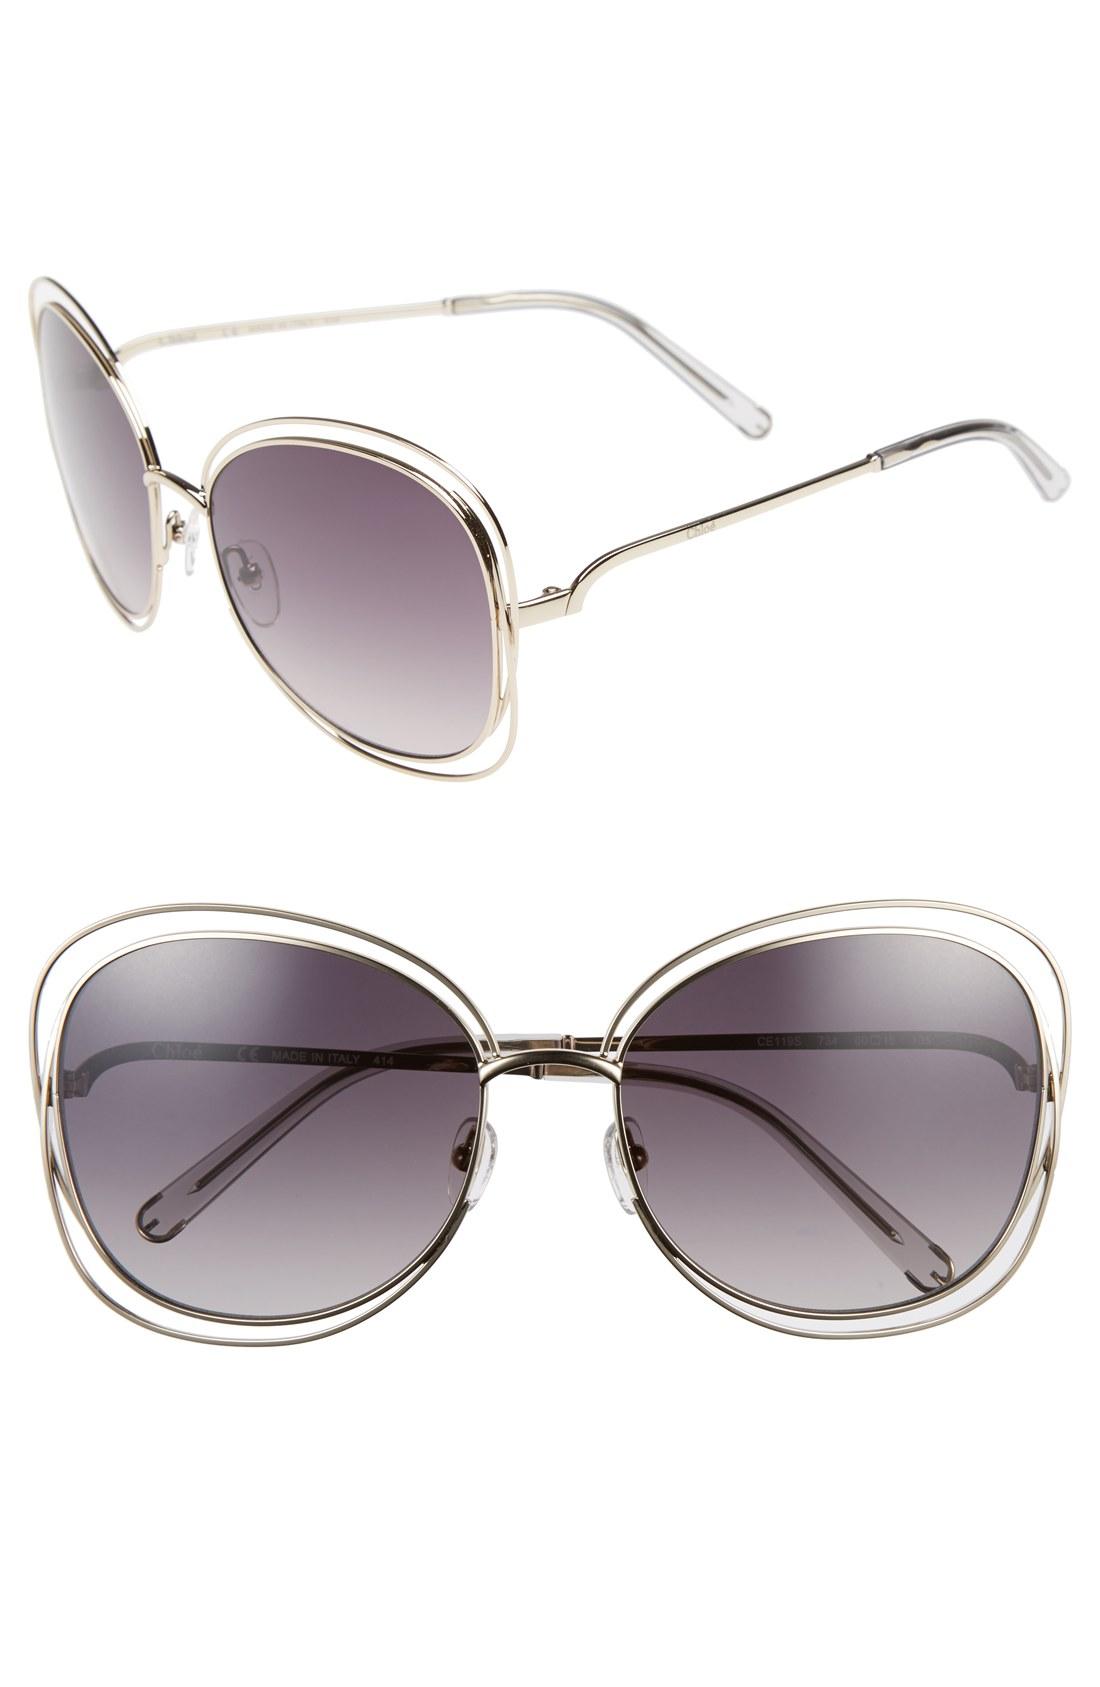 286b7f119c Chloé  Carlina  60mm Oversize Sunglasses